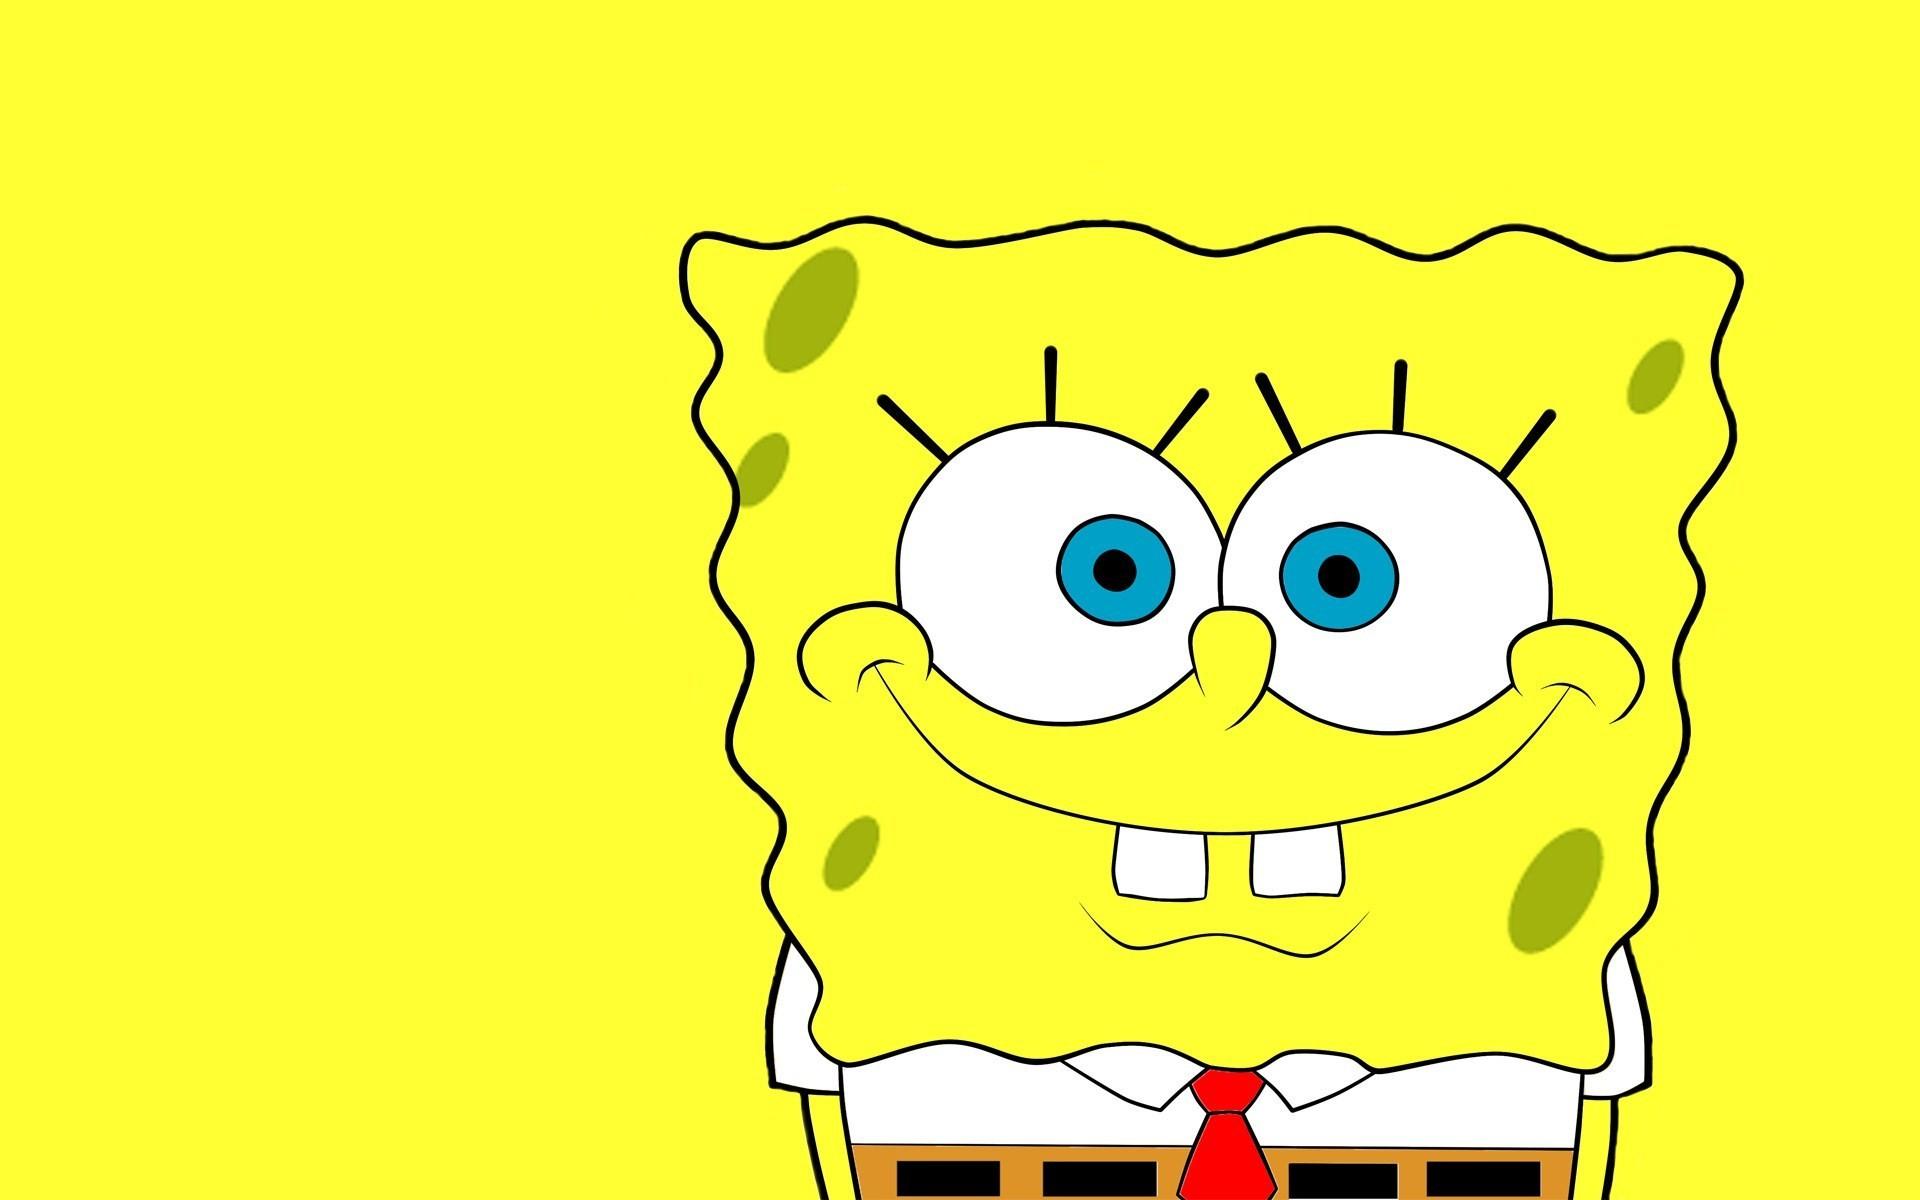 Spongebob Background Download Free Beautiful Full Hd Wallpapers